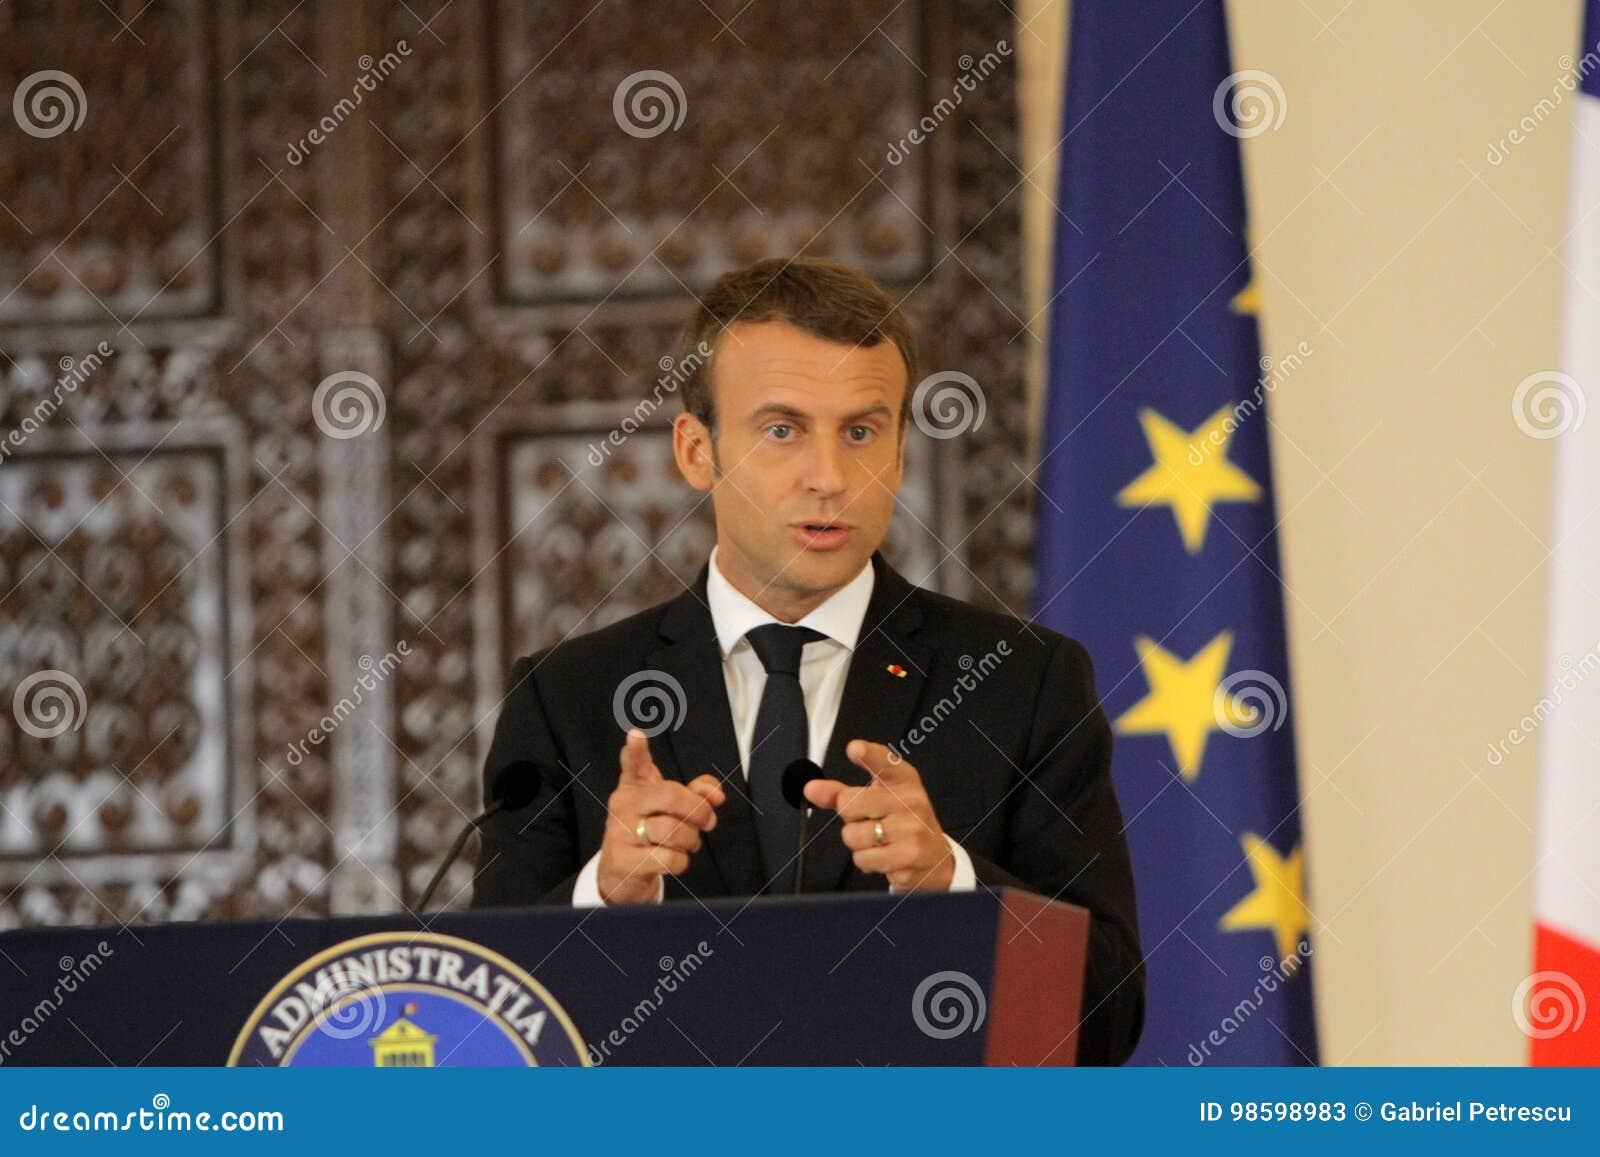 Fransk president Emmanuel Macron